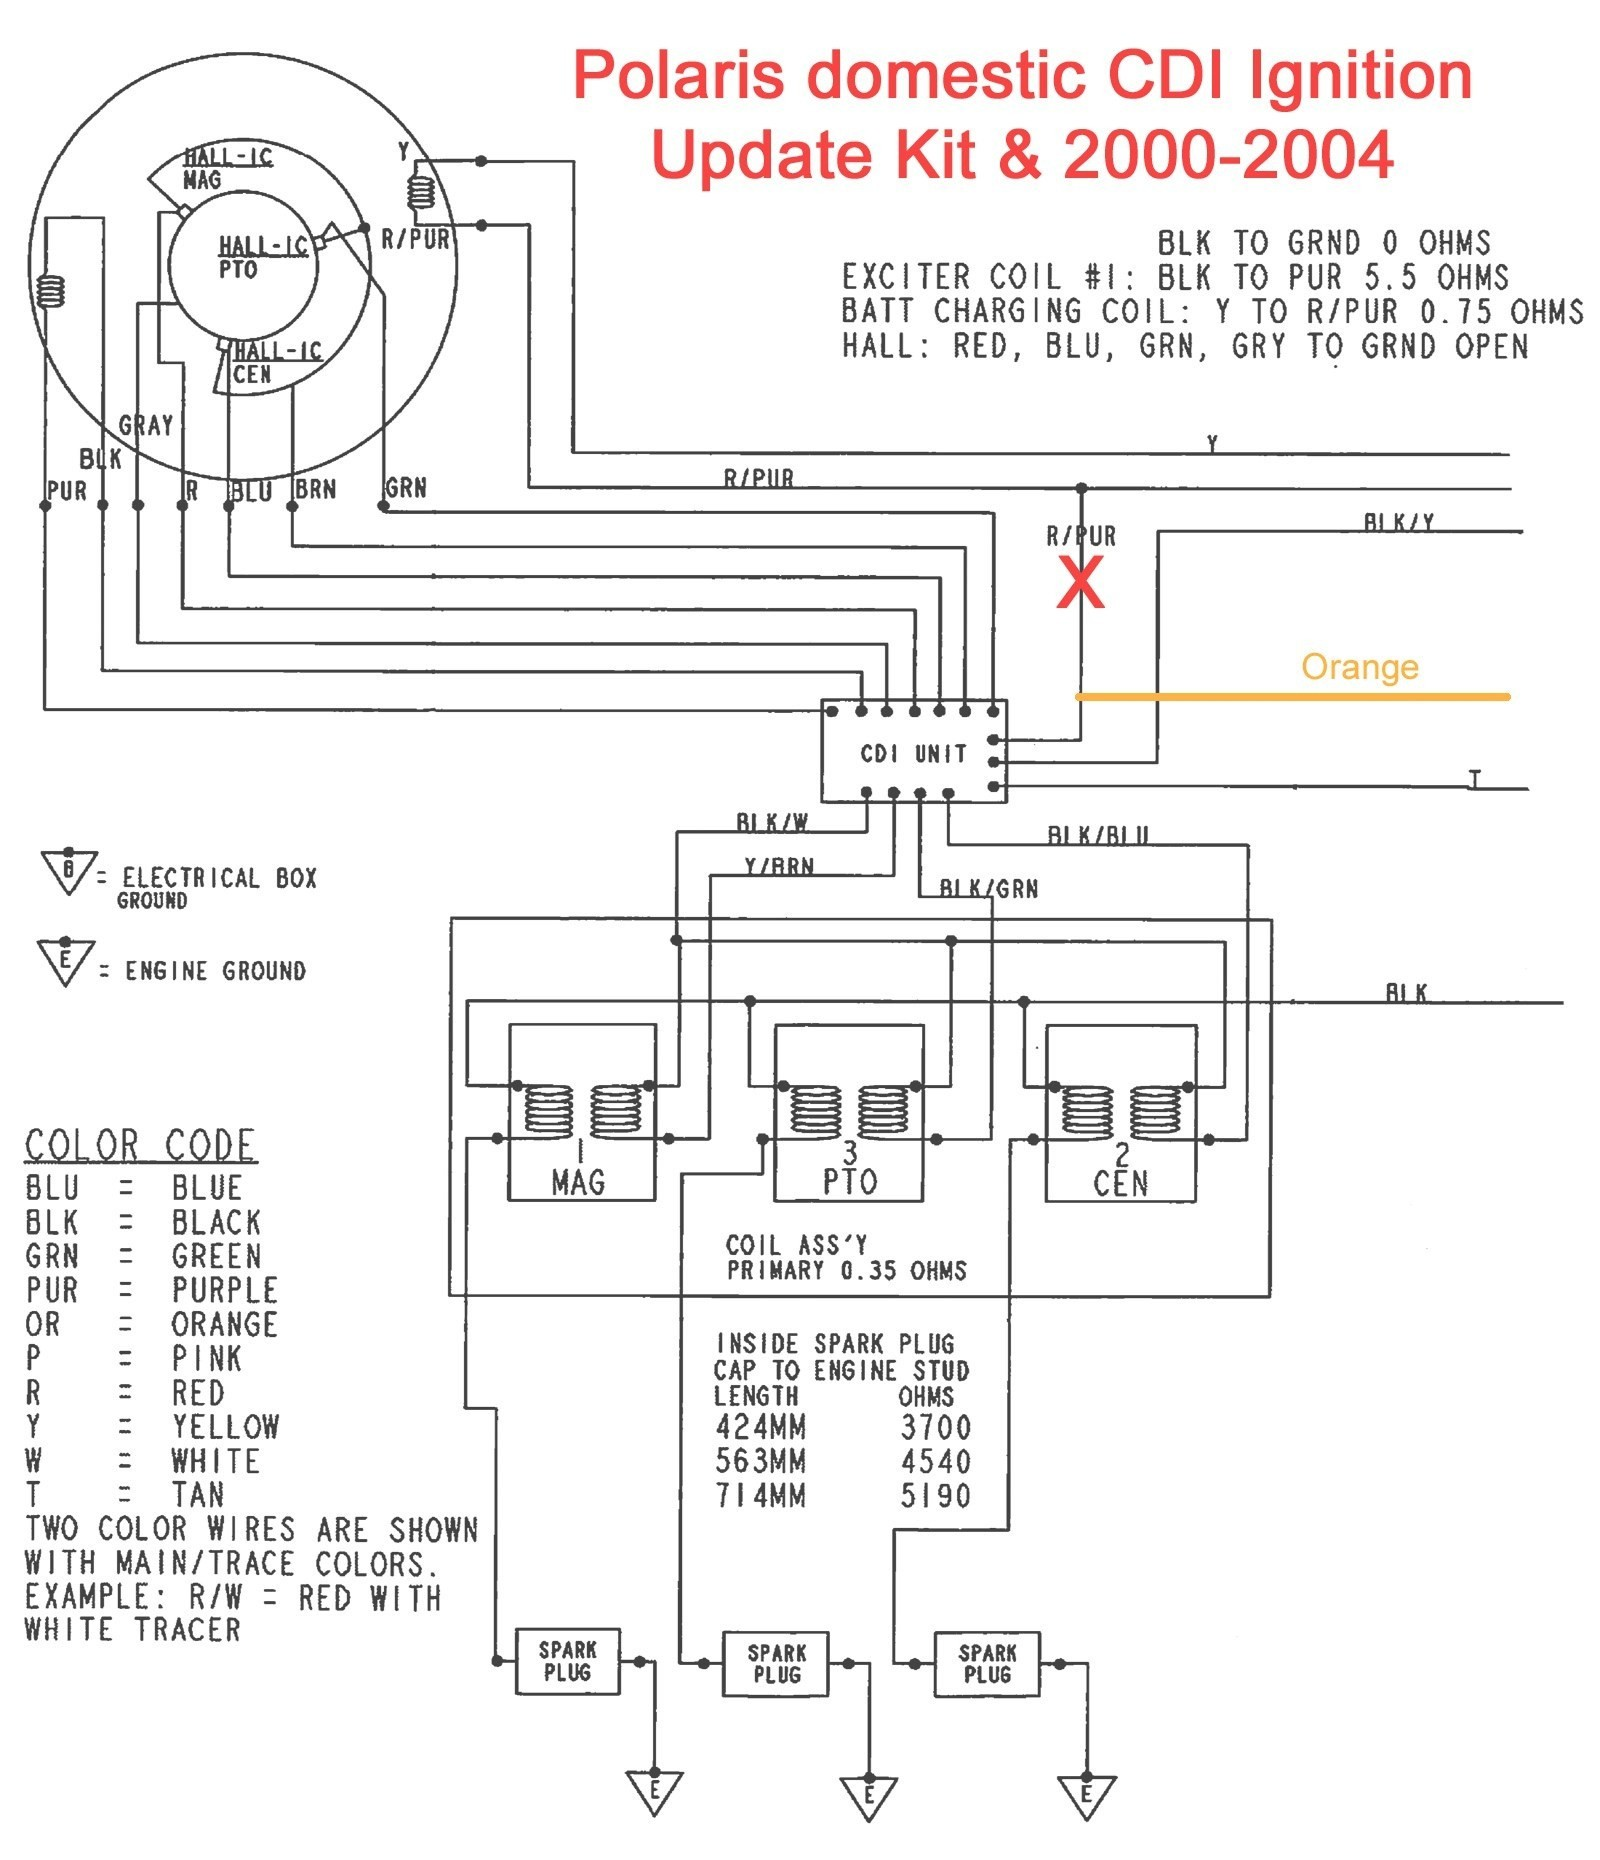 Polaris Predator 500 Engine Diagram Wiring Diagram for Polaris Scrambler 90  Polaris Scrambler 90 Of Polaris